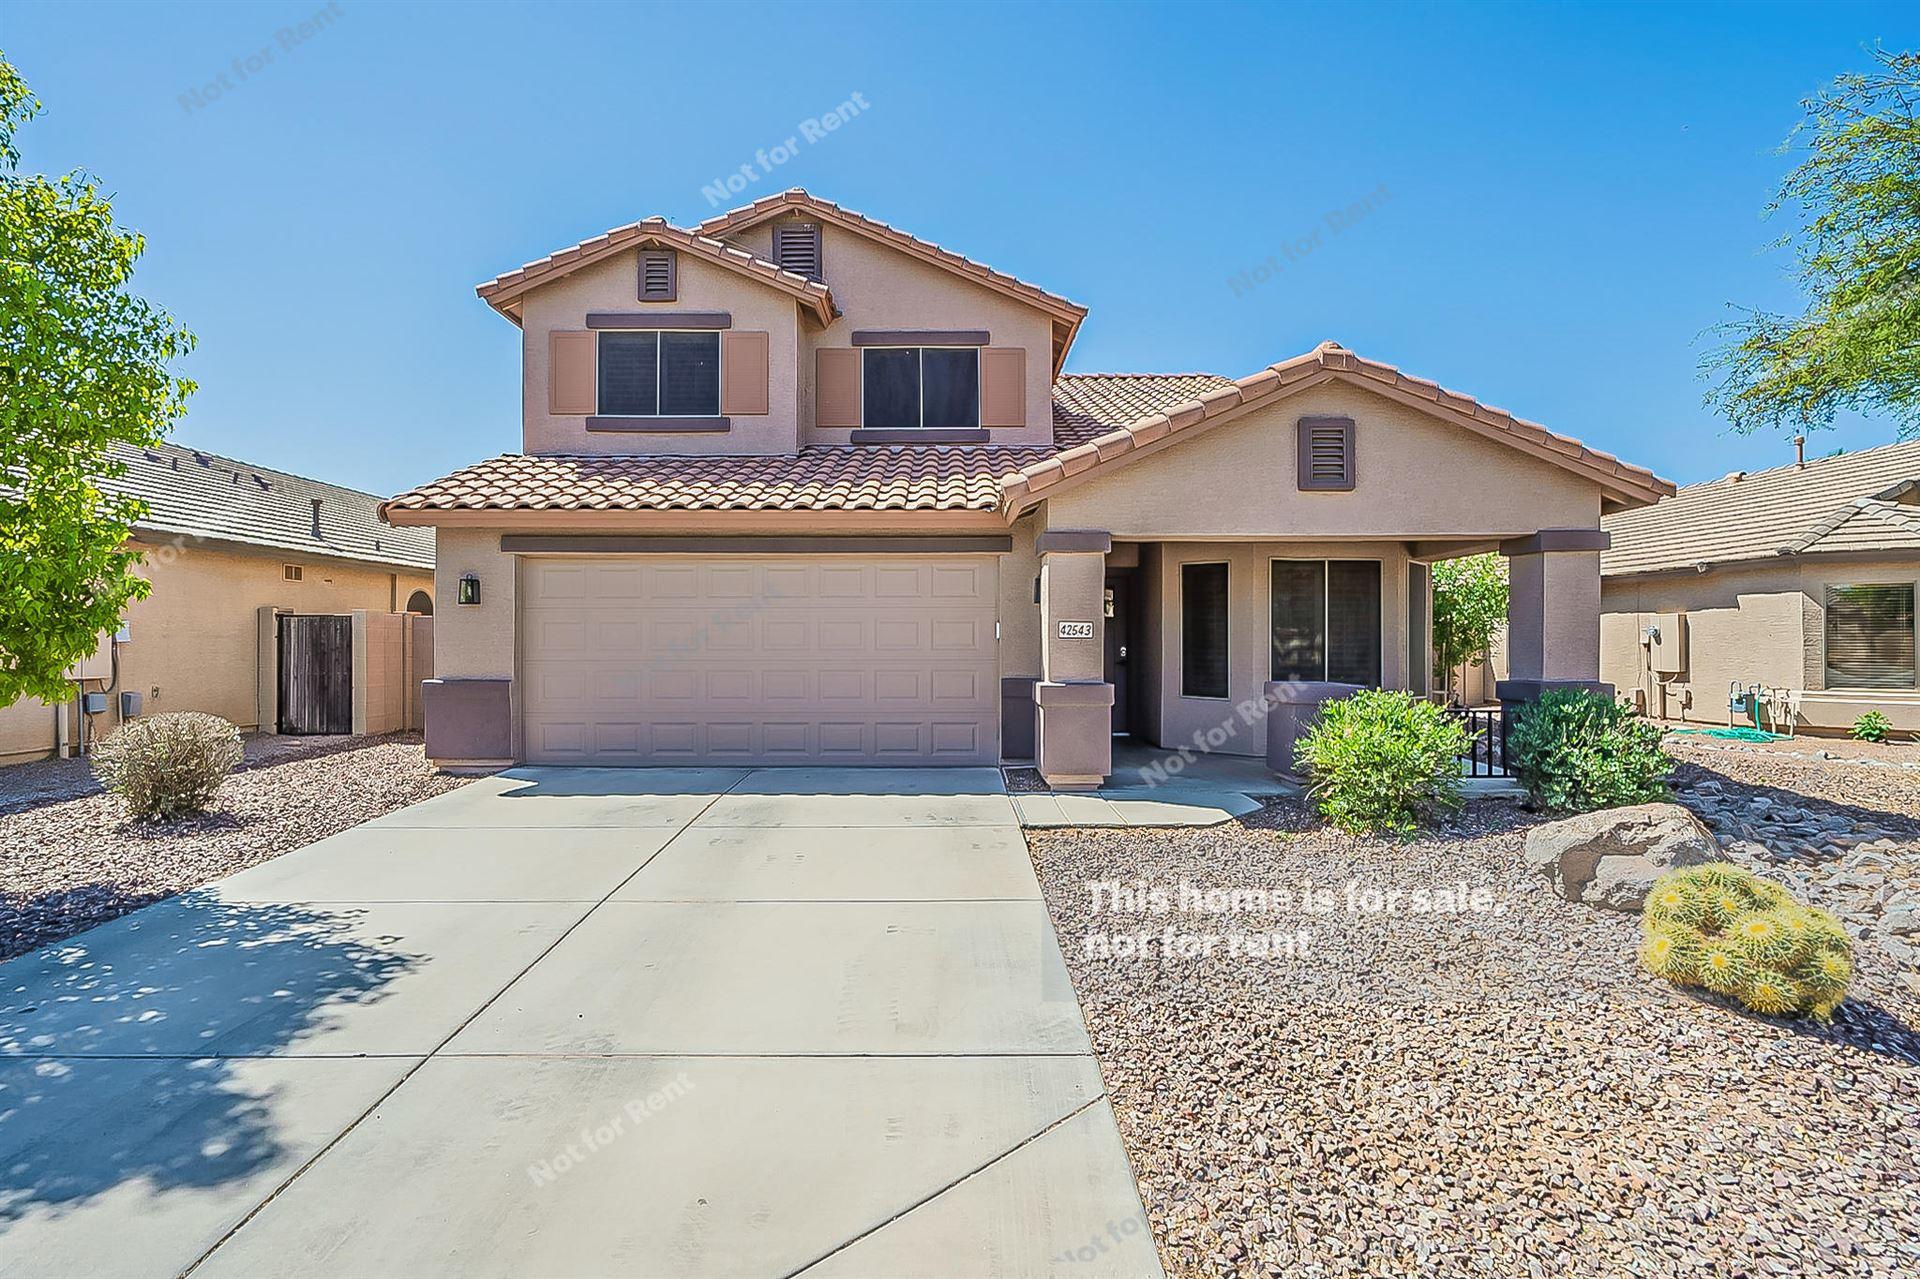 Photo of 42543 W CHAMBERS Drive, Maricopa, AZ 85138 (MLS # 6231422)